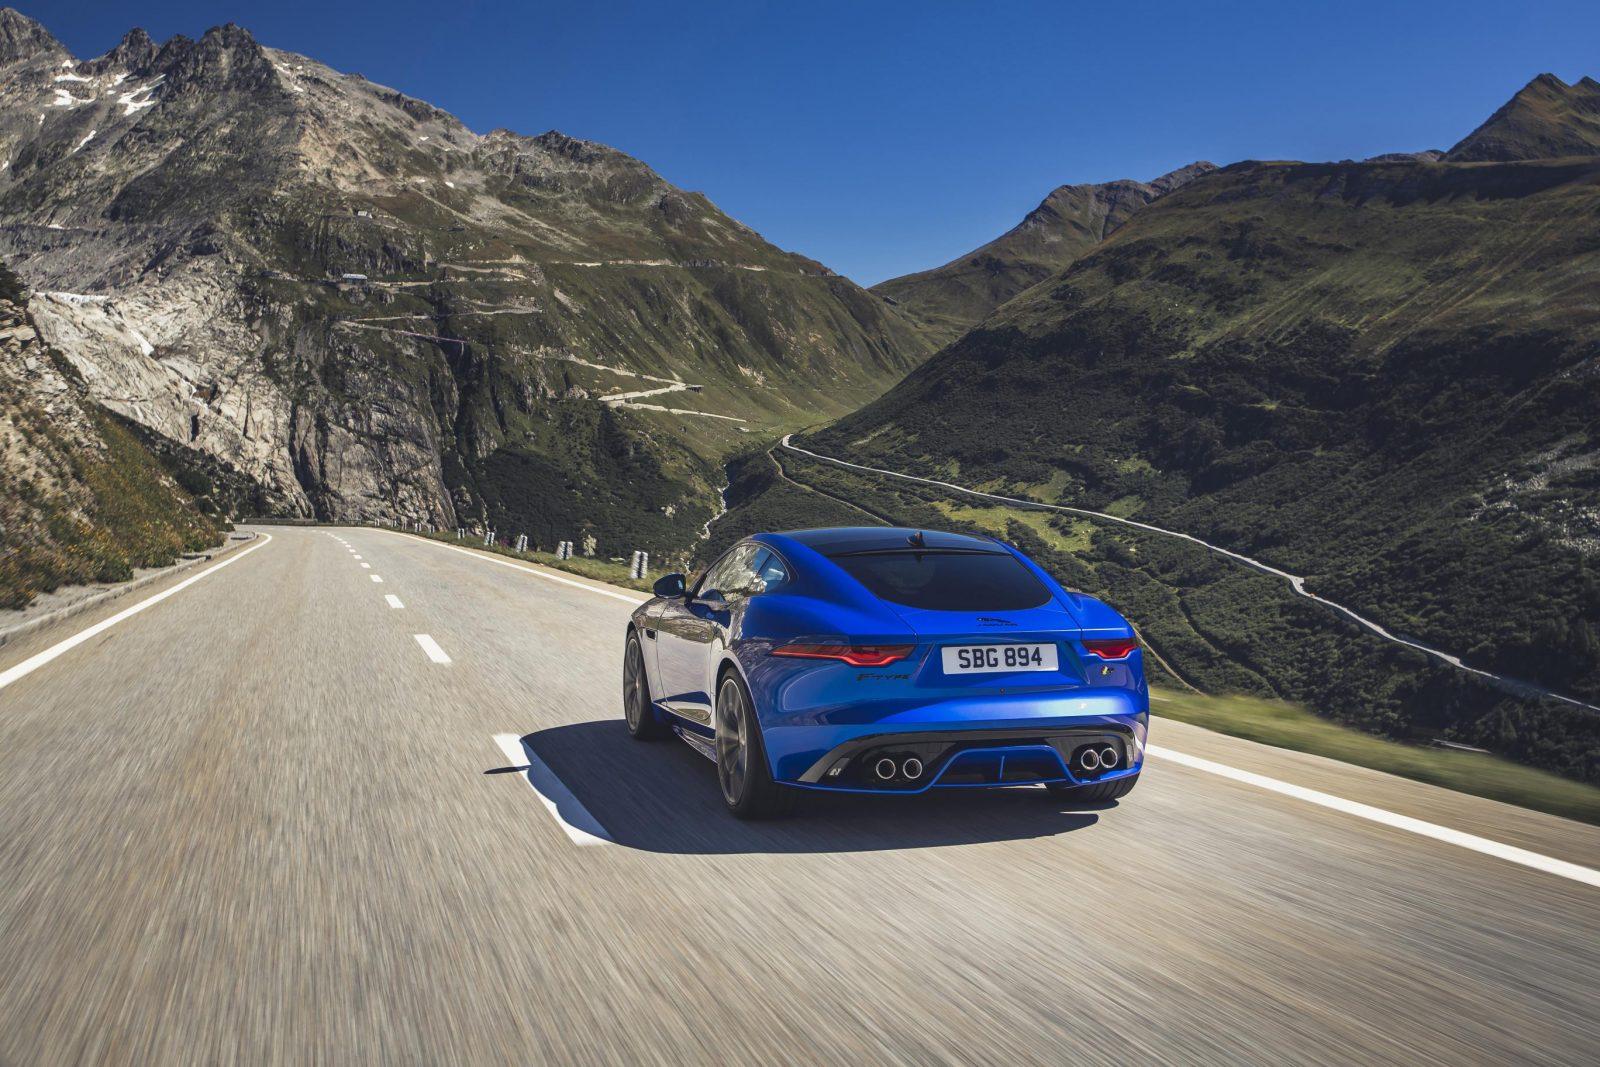 Jag F Type R 21my Velocity Blue Reveal Switzerland 02.12.19 08